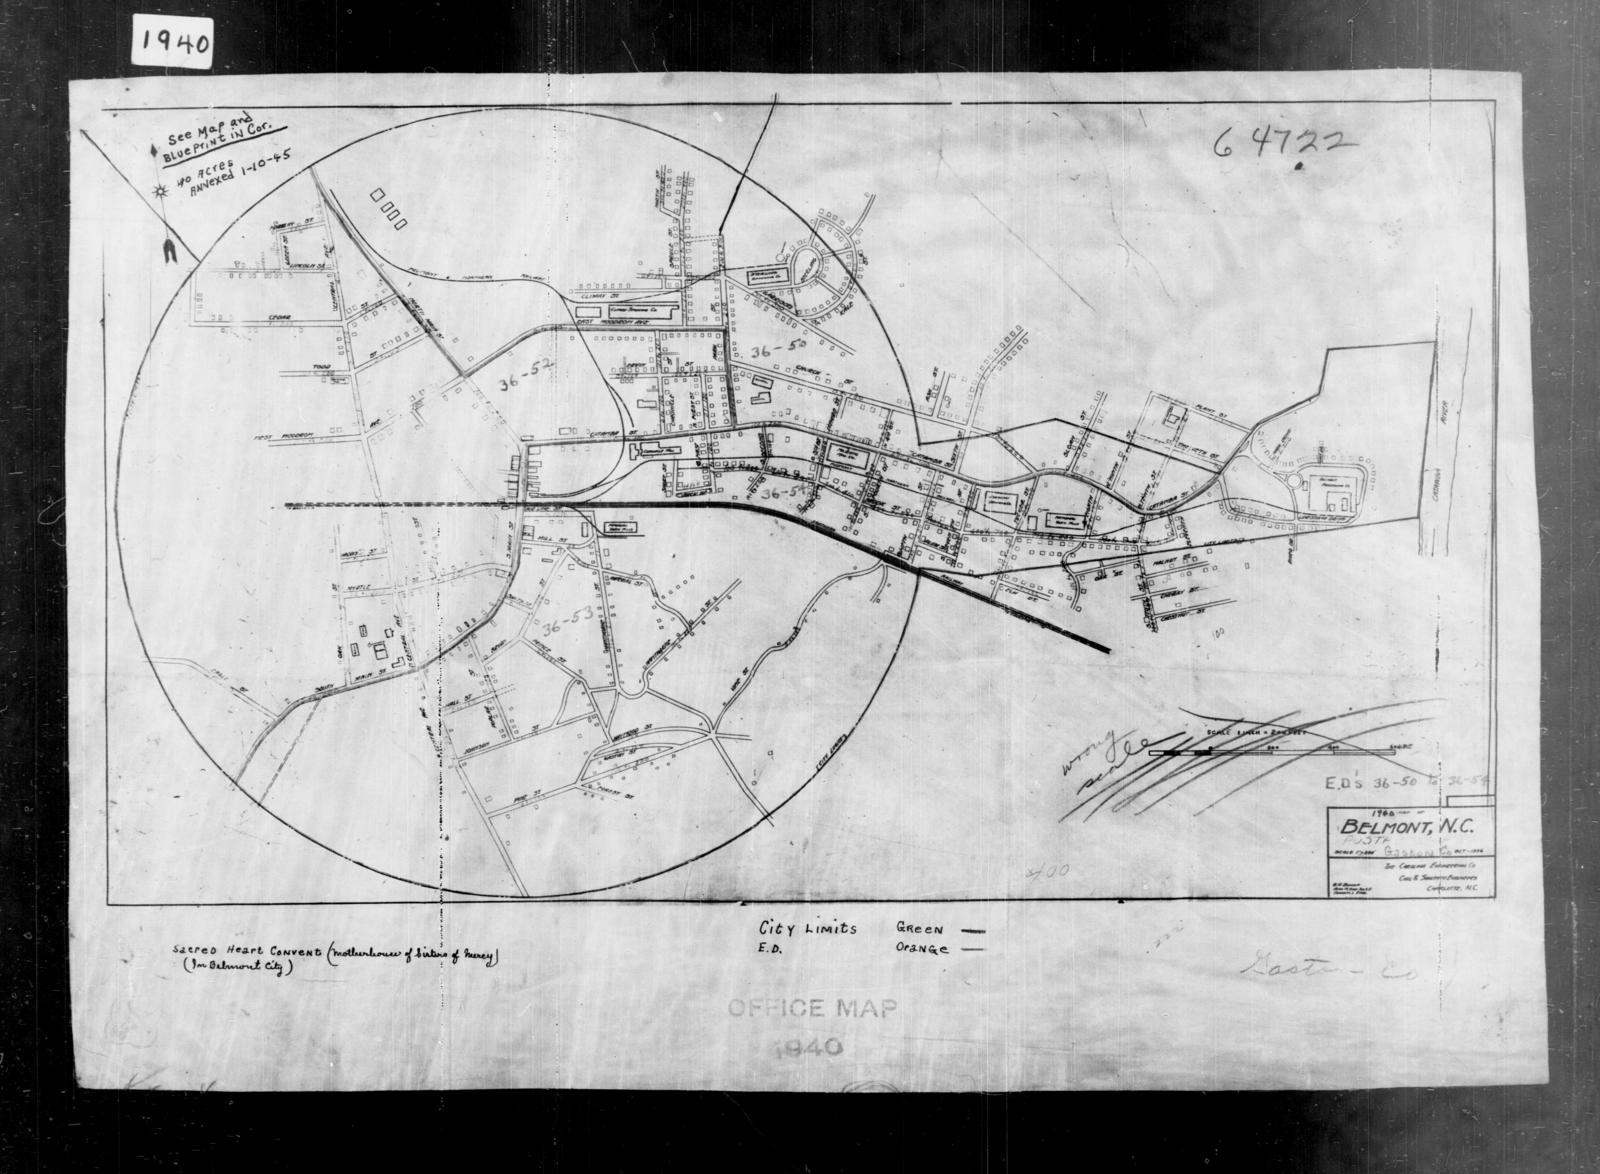 Gaston Nc Map.1940 Census Enumeration District Maps North Carolina Gaston